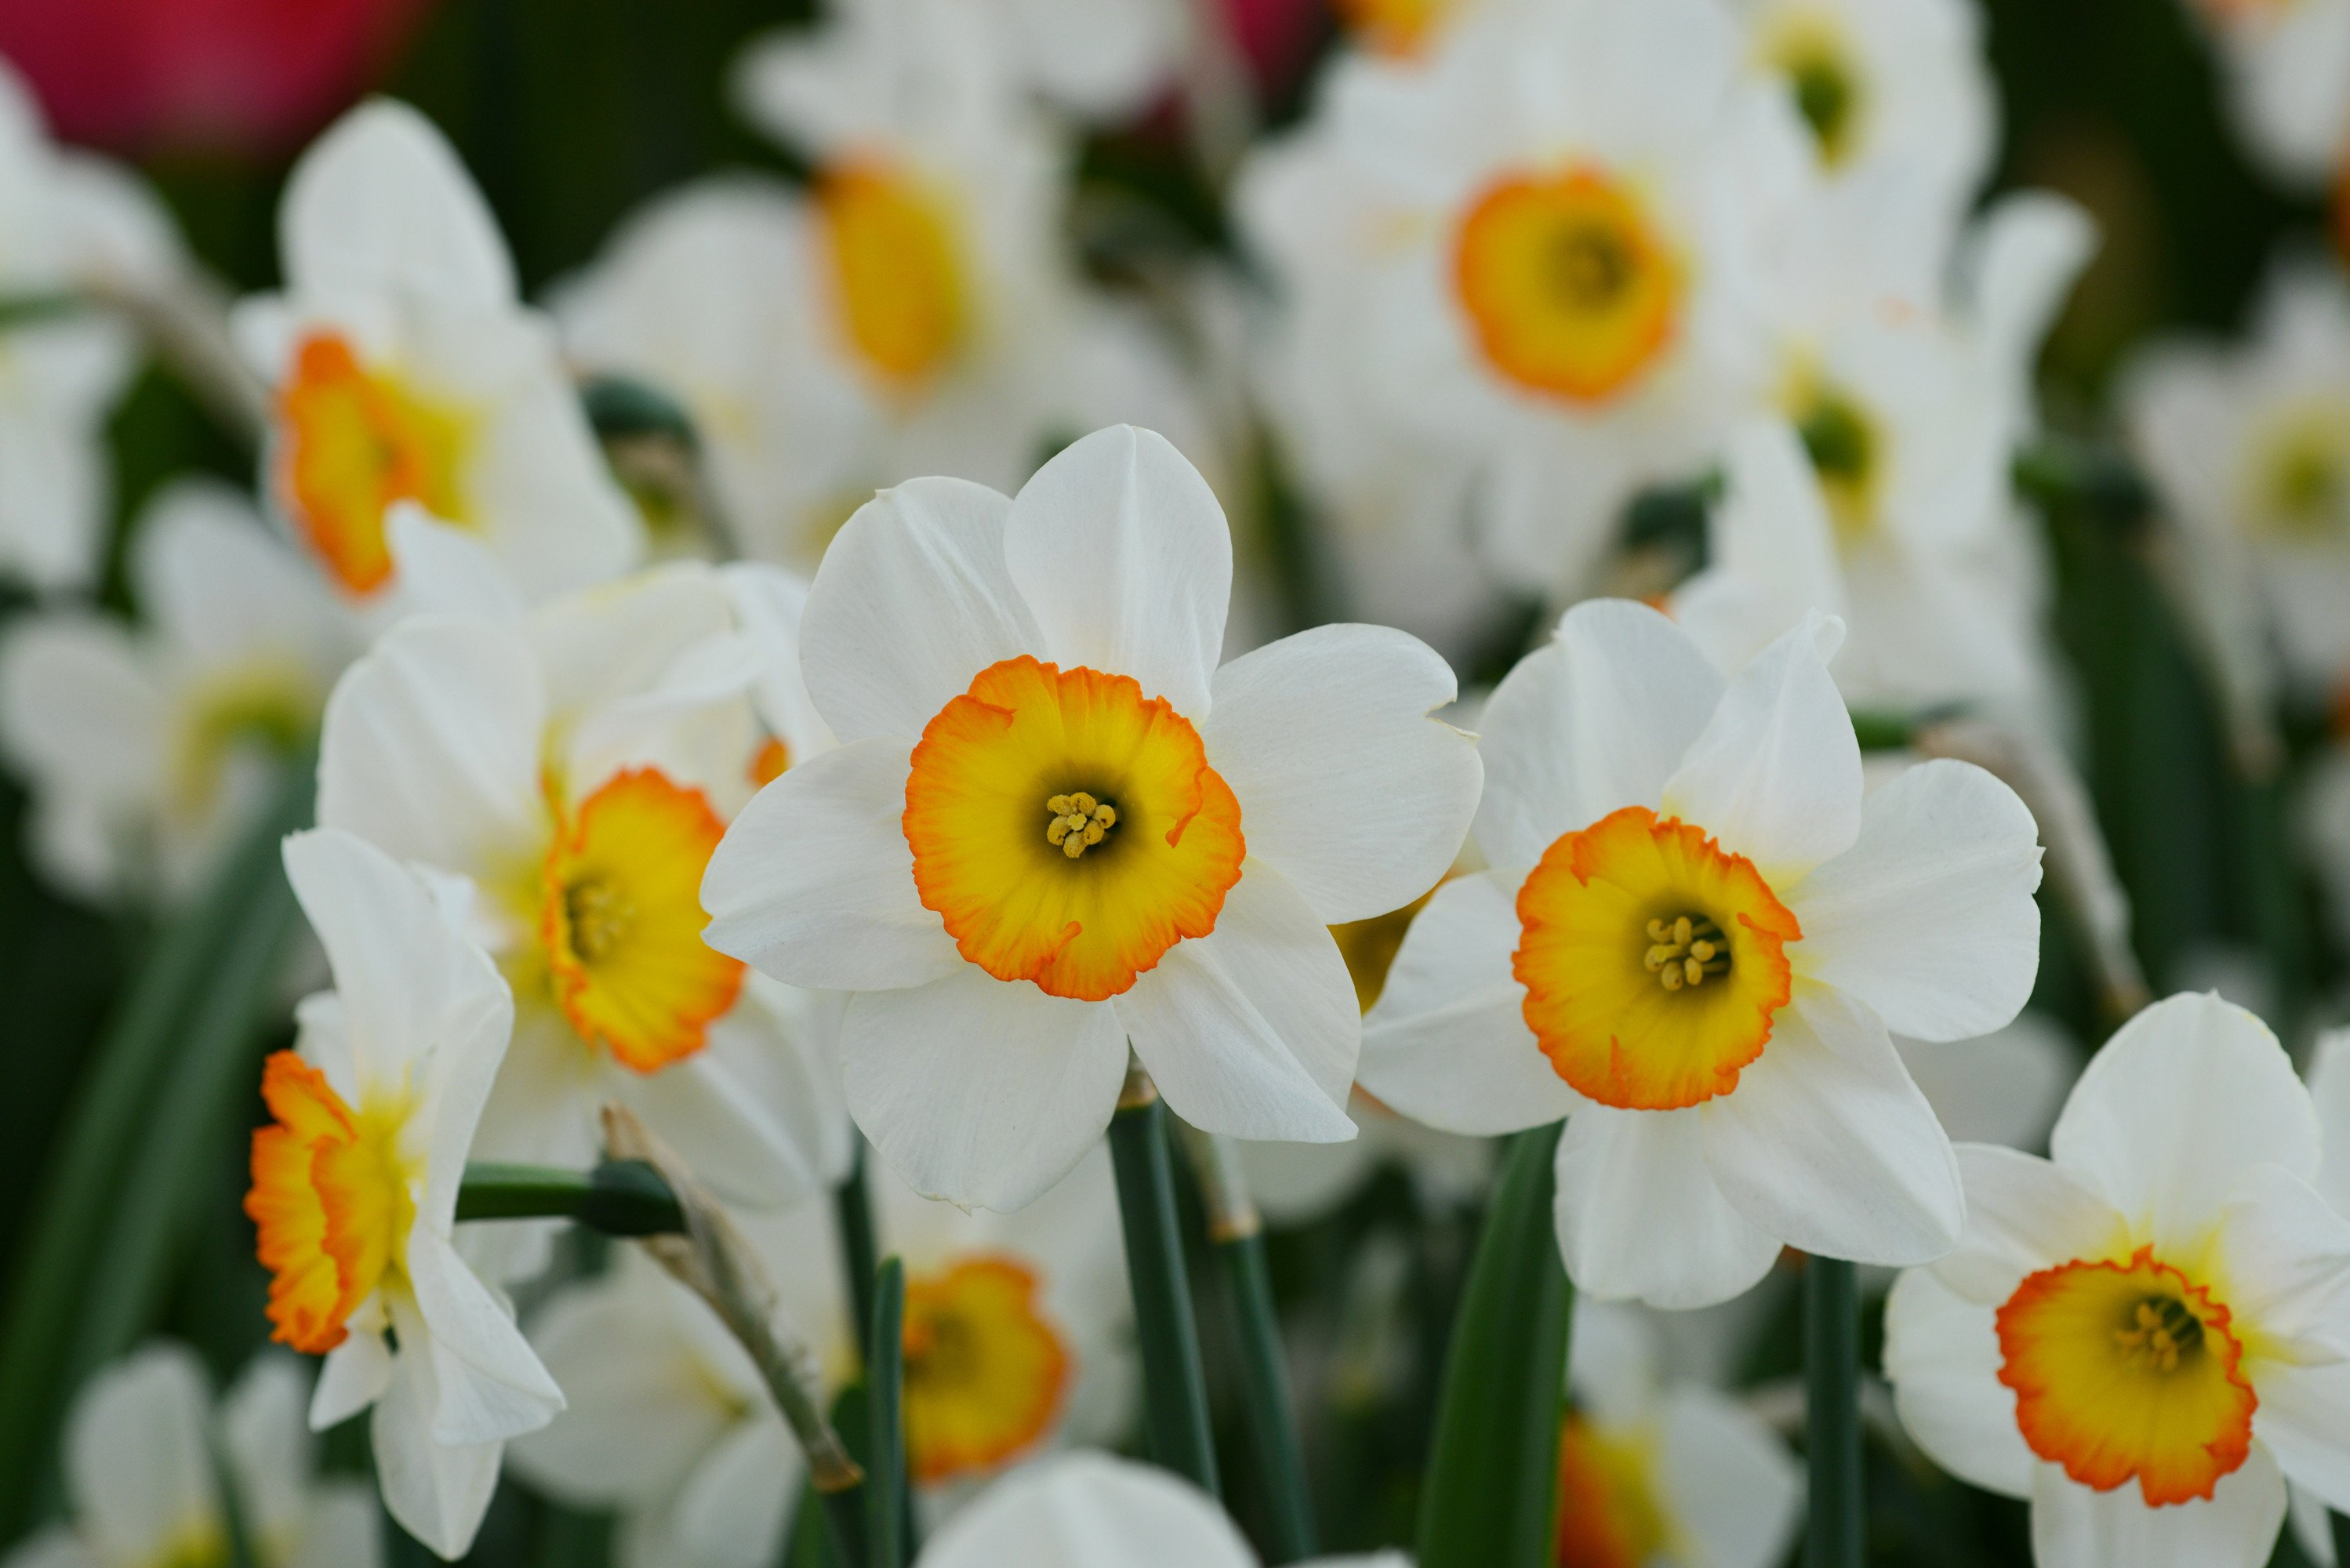 Daffodil Flower Record Daffodil Flower Daffodils Bulb Flowers